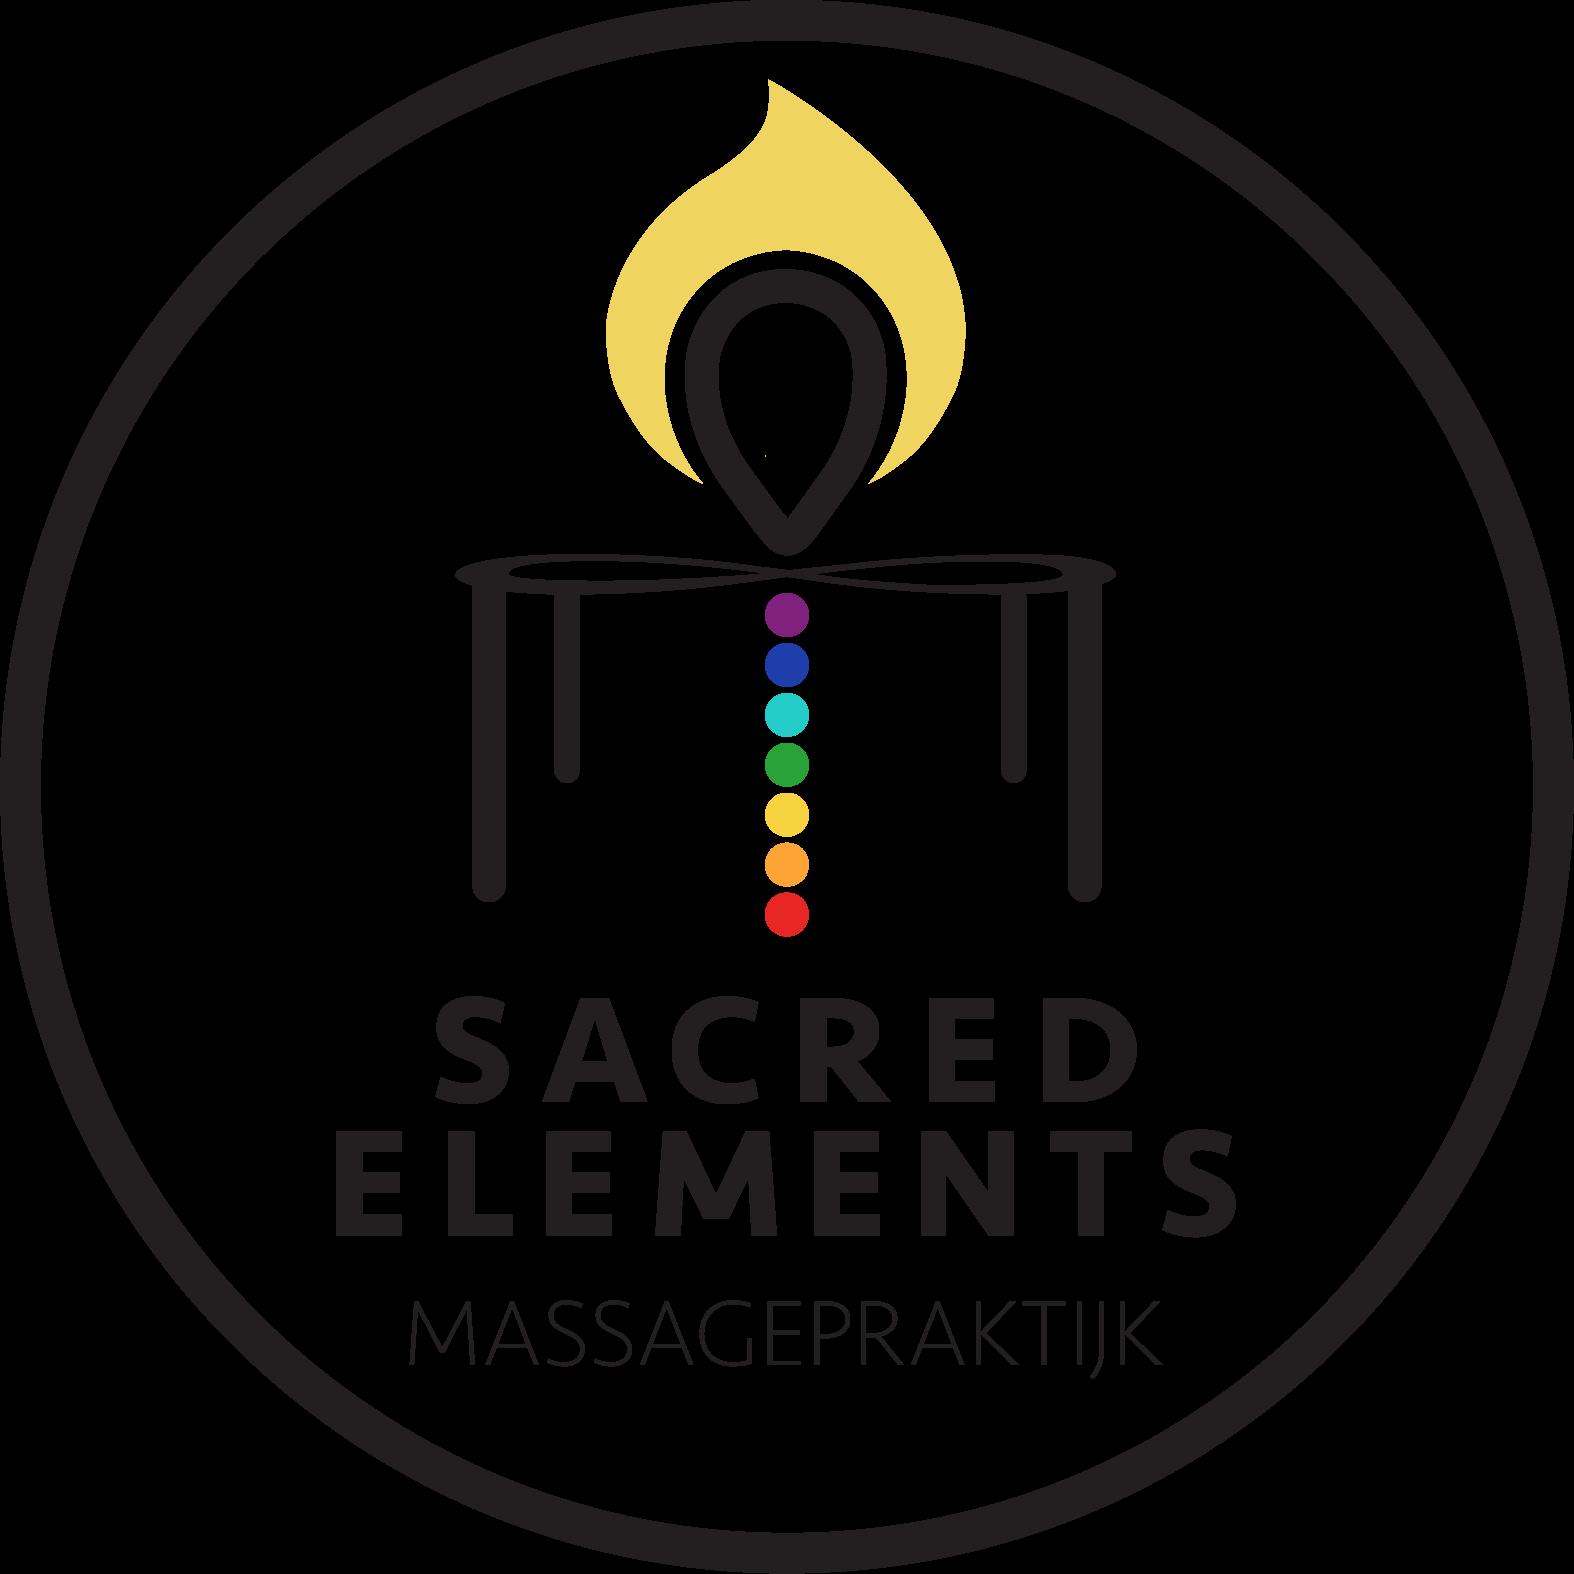 Sacred Elements